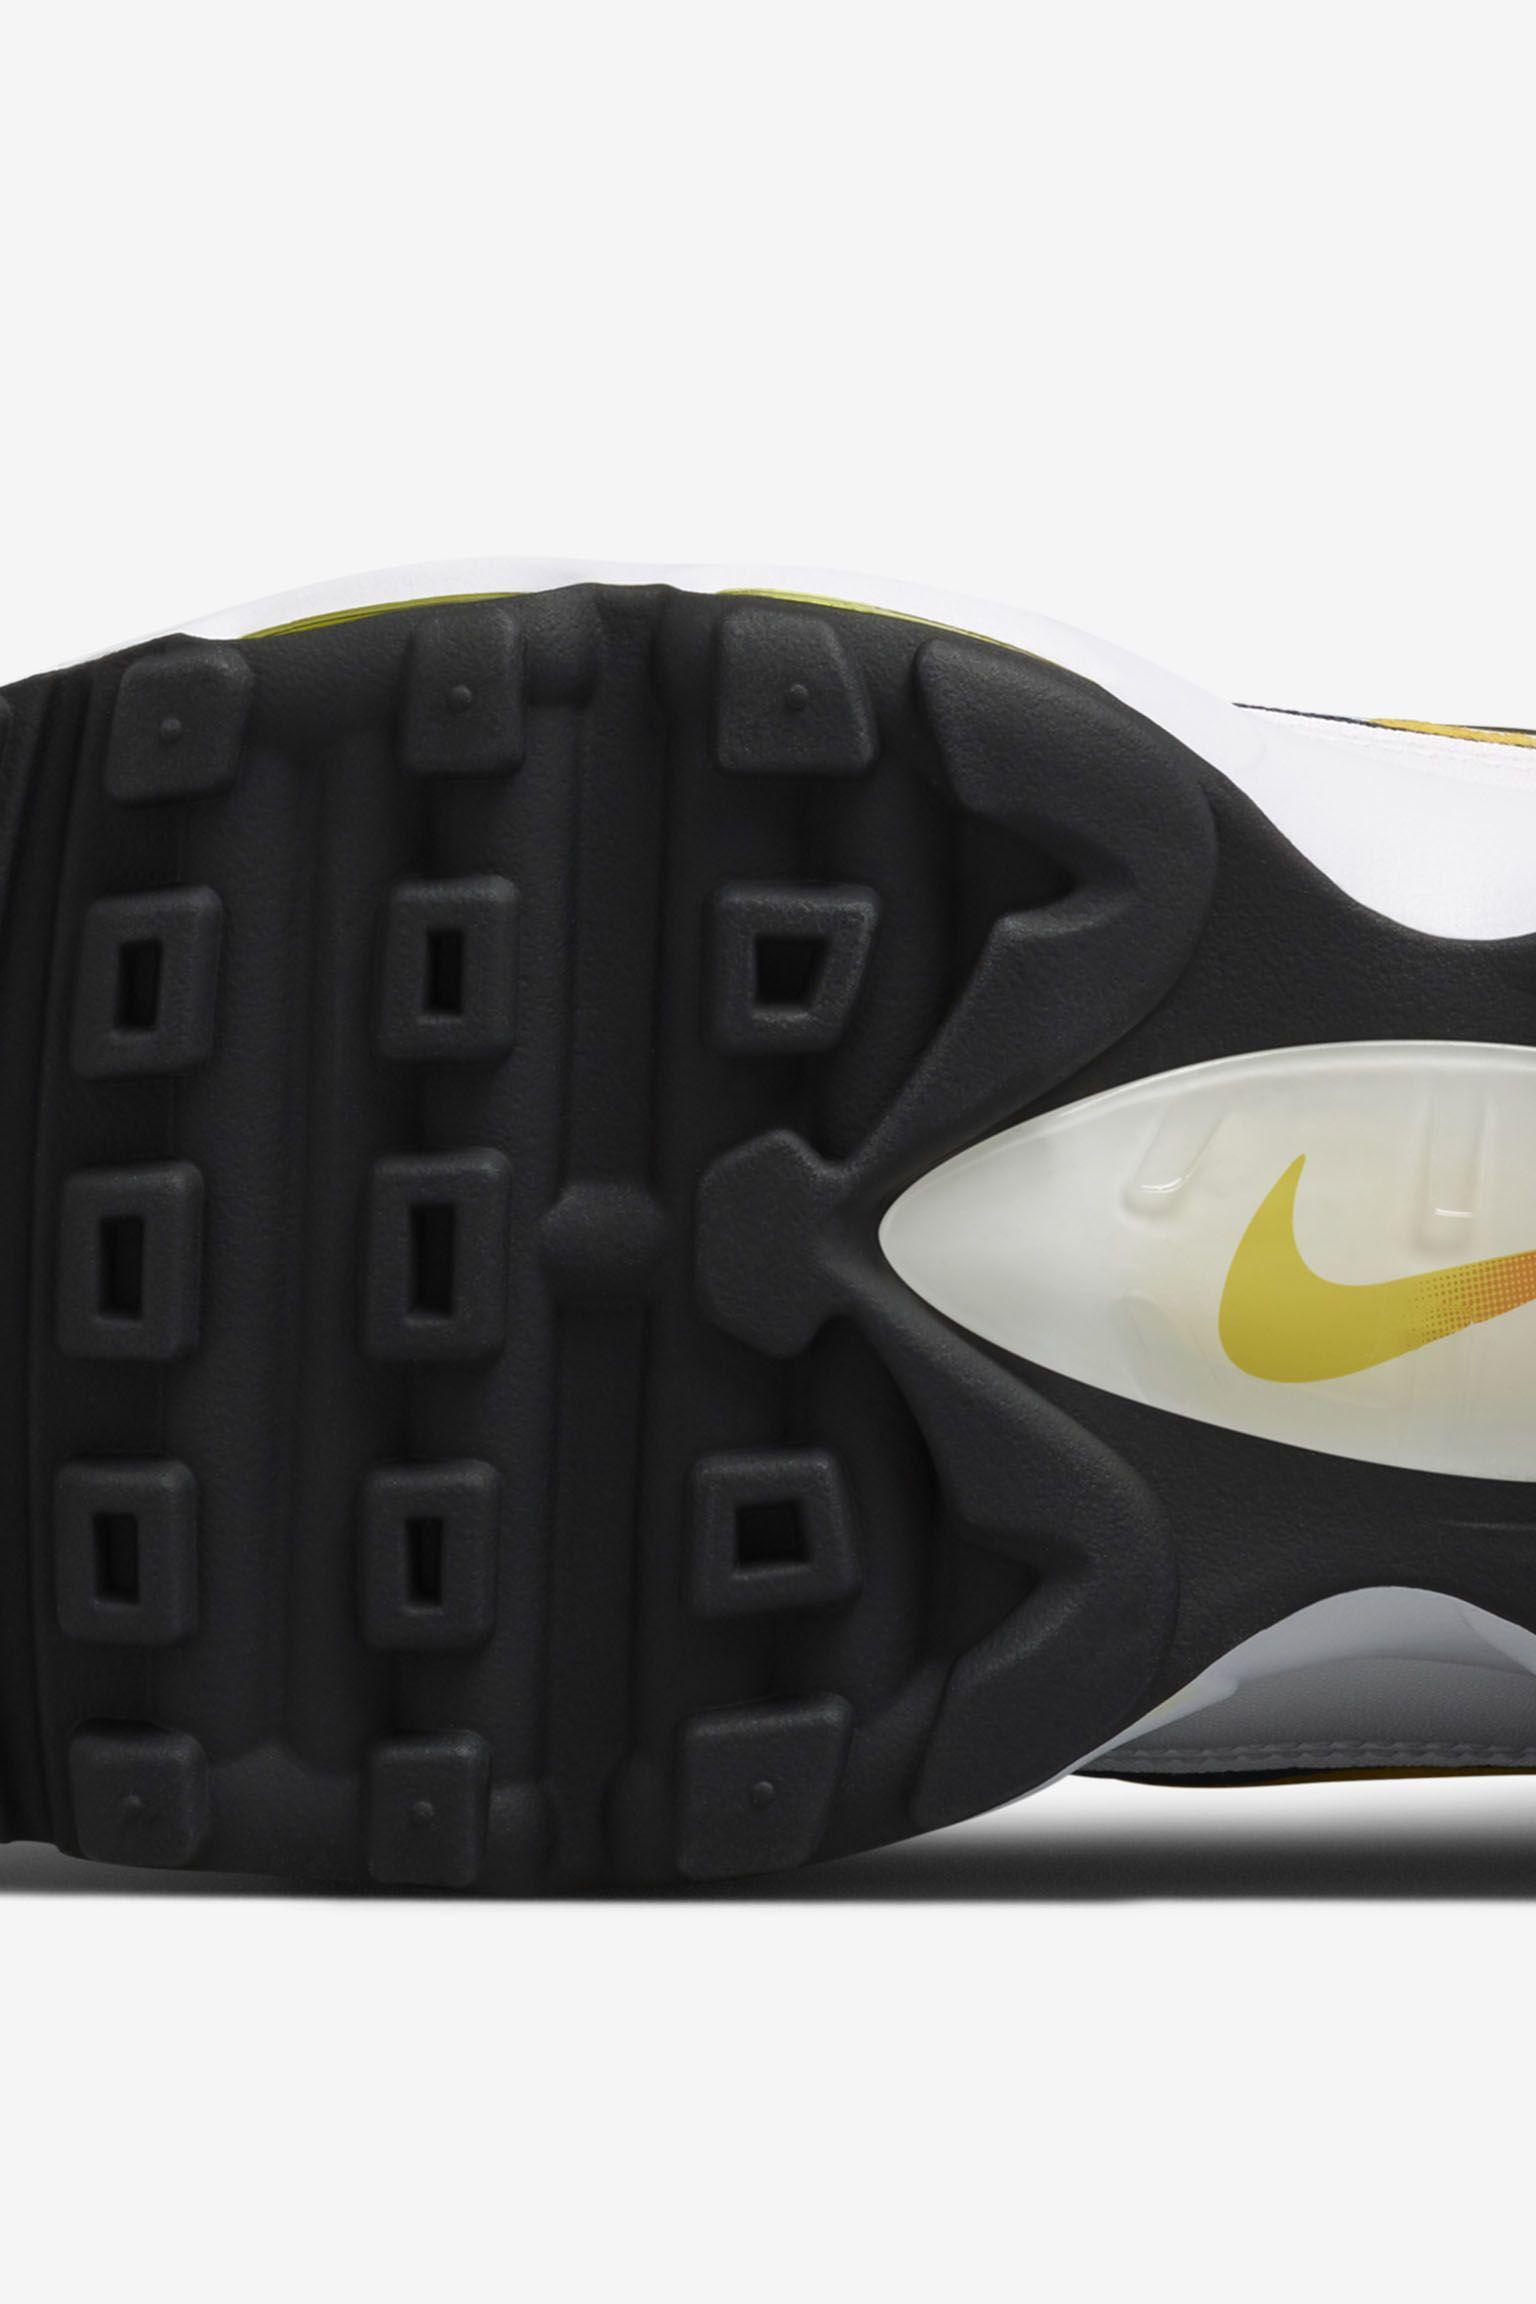 Nike Air Max 96 2 XX Modern Max 'Navy & Goldenrod'